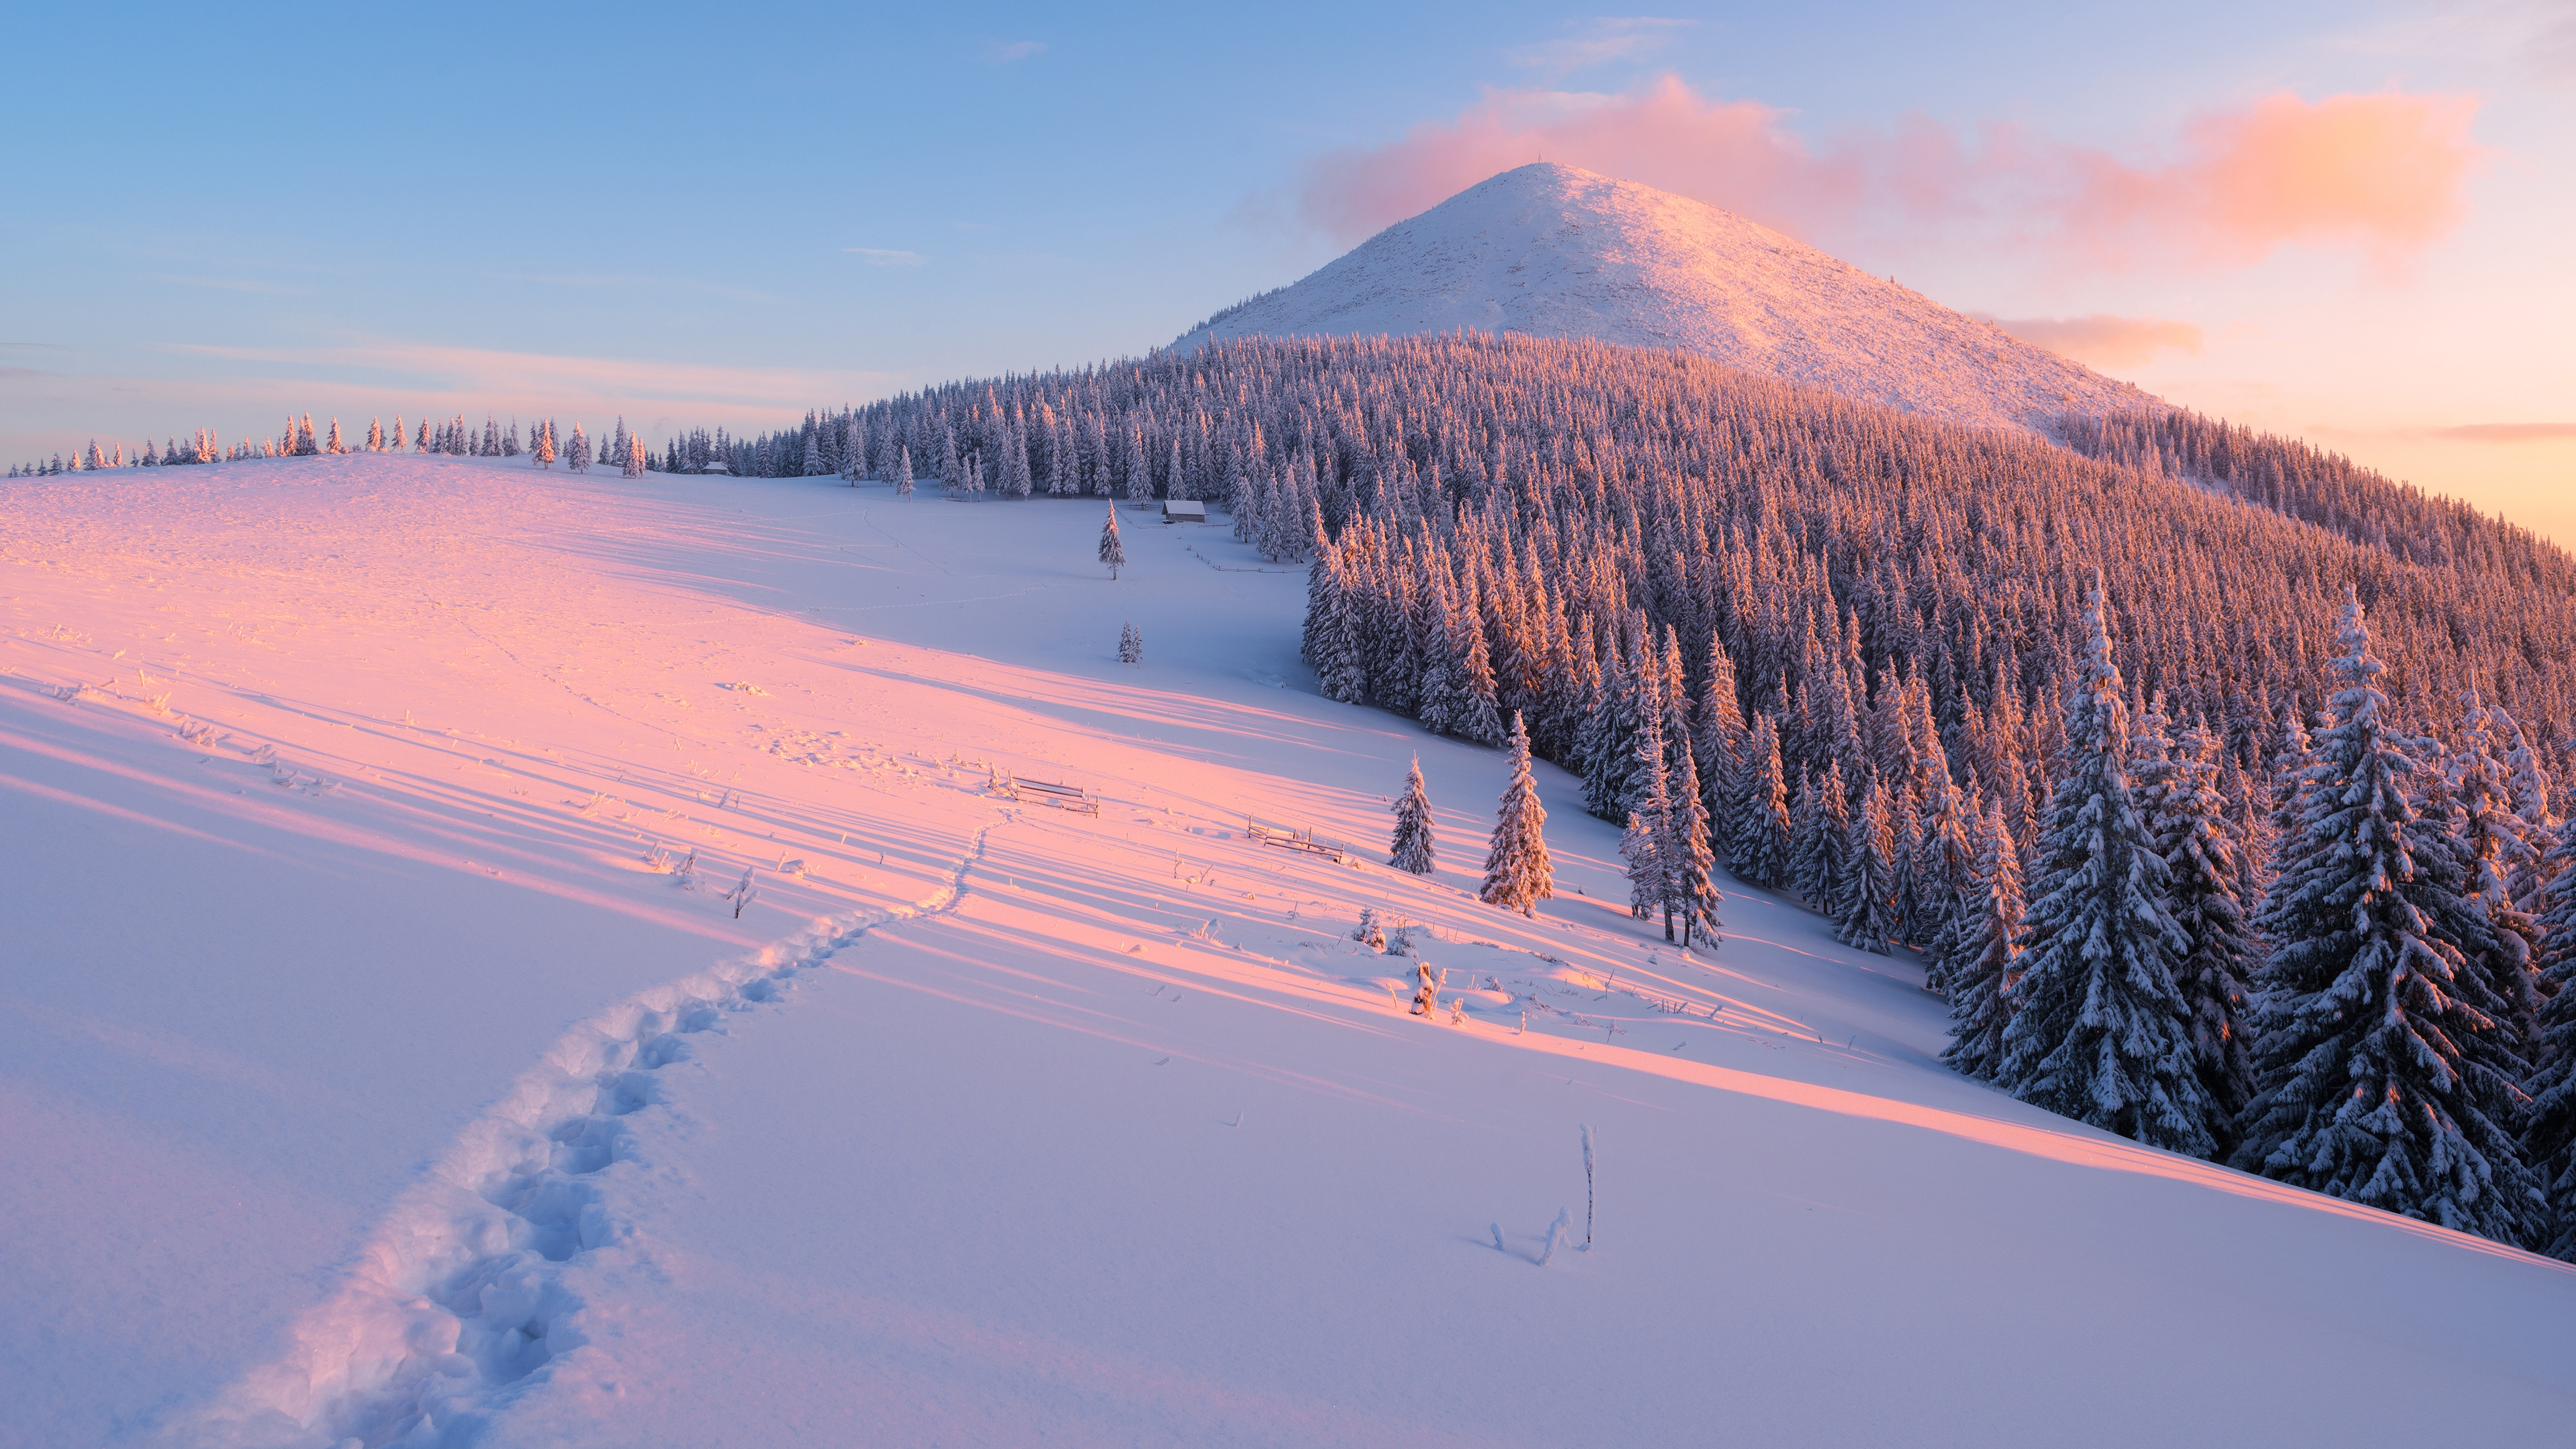 Winter 4k Ultra HD Wallpaper | Background Image | 4493x2527 | ID:783599 - Wallpaper Abyss